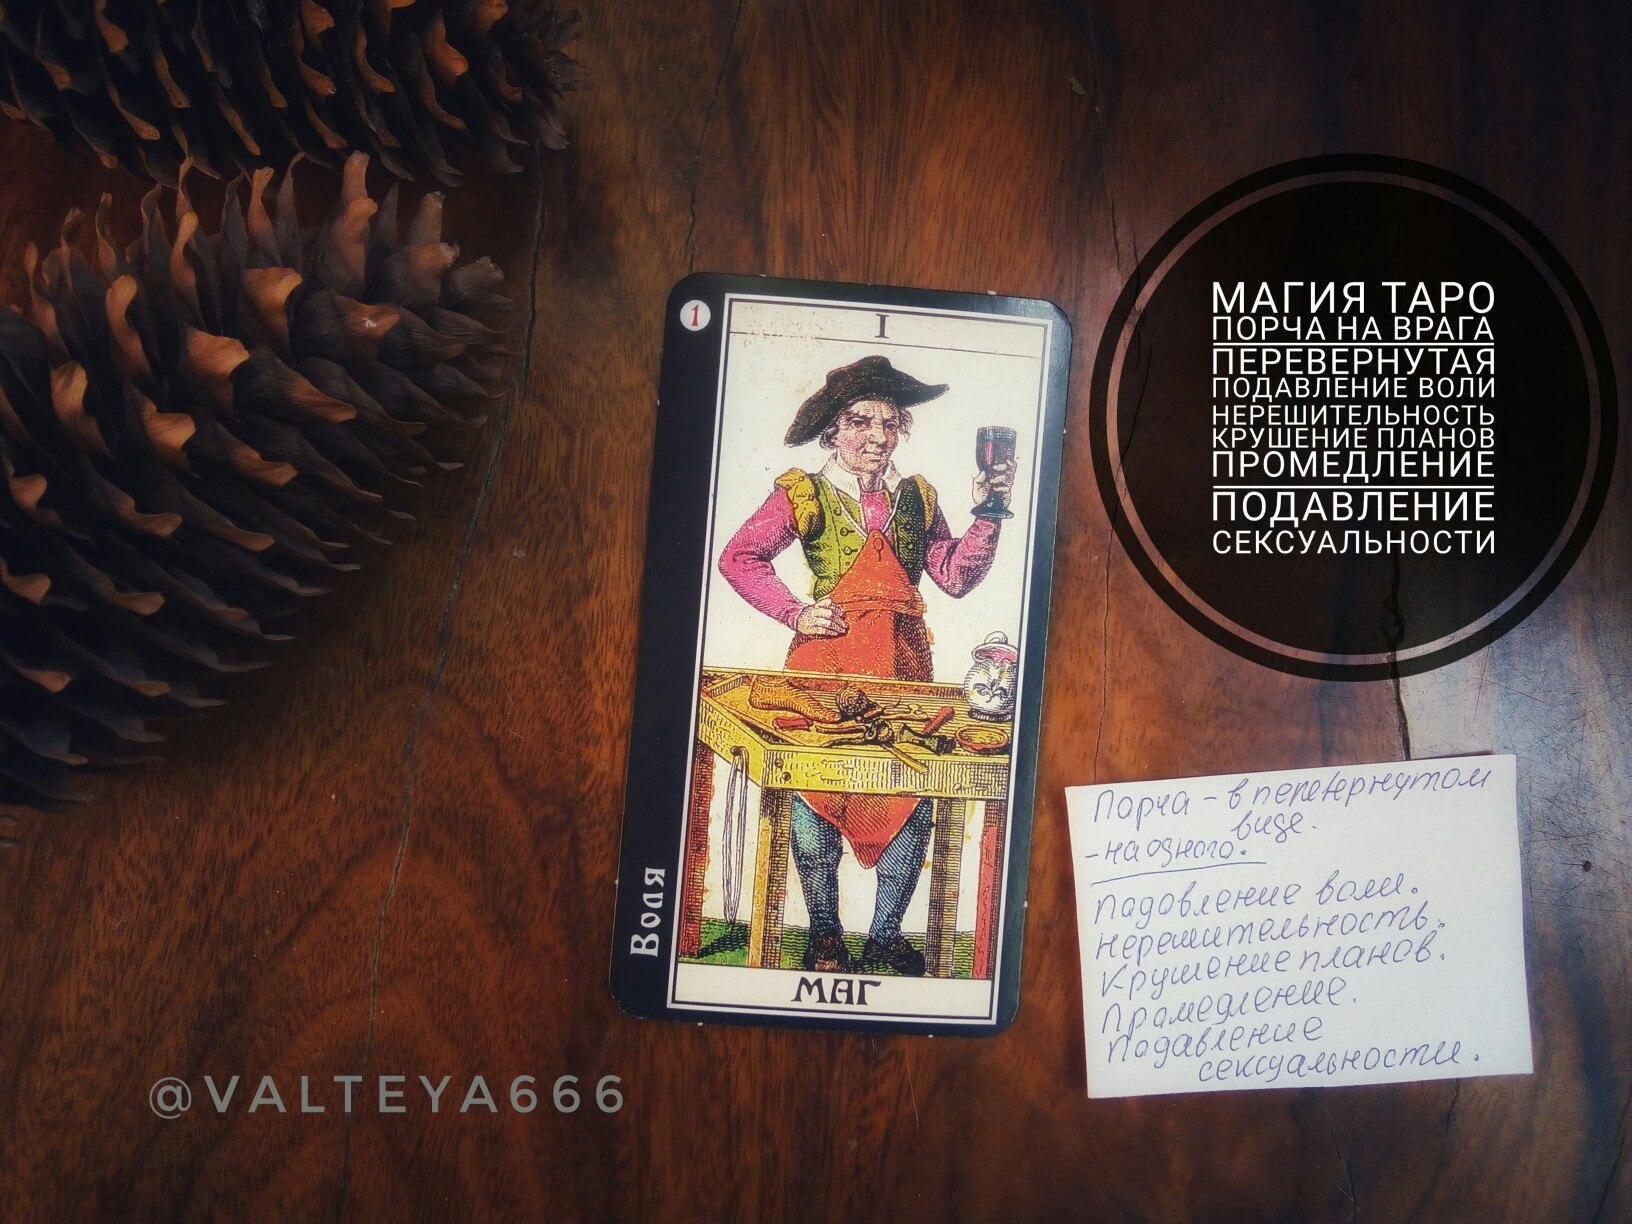 Хештег таро на   Салон Магии и мистики Елены Руденко ( Валтеи ). Киев ,тел: 0506251562  Xa-l1Hh2MO8